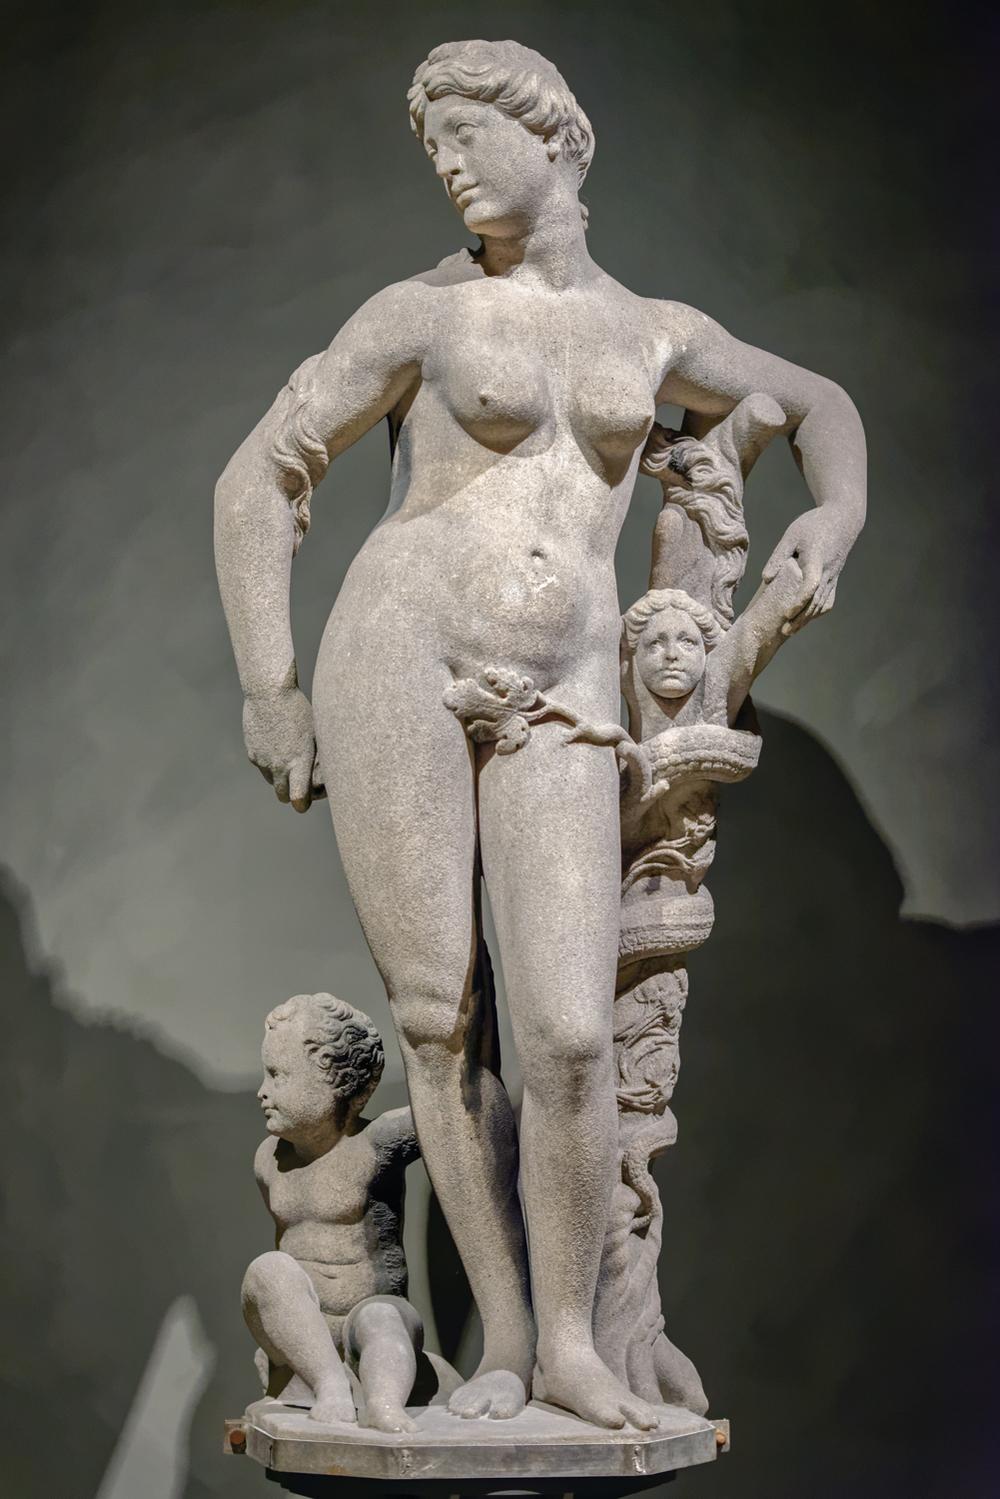 Eve. Giovan Angelo Marini, 1563-1565. Candoglia marble.